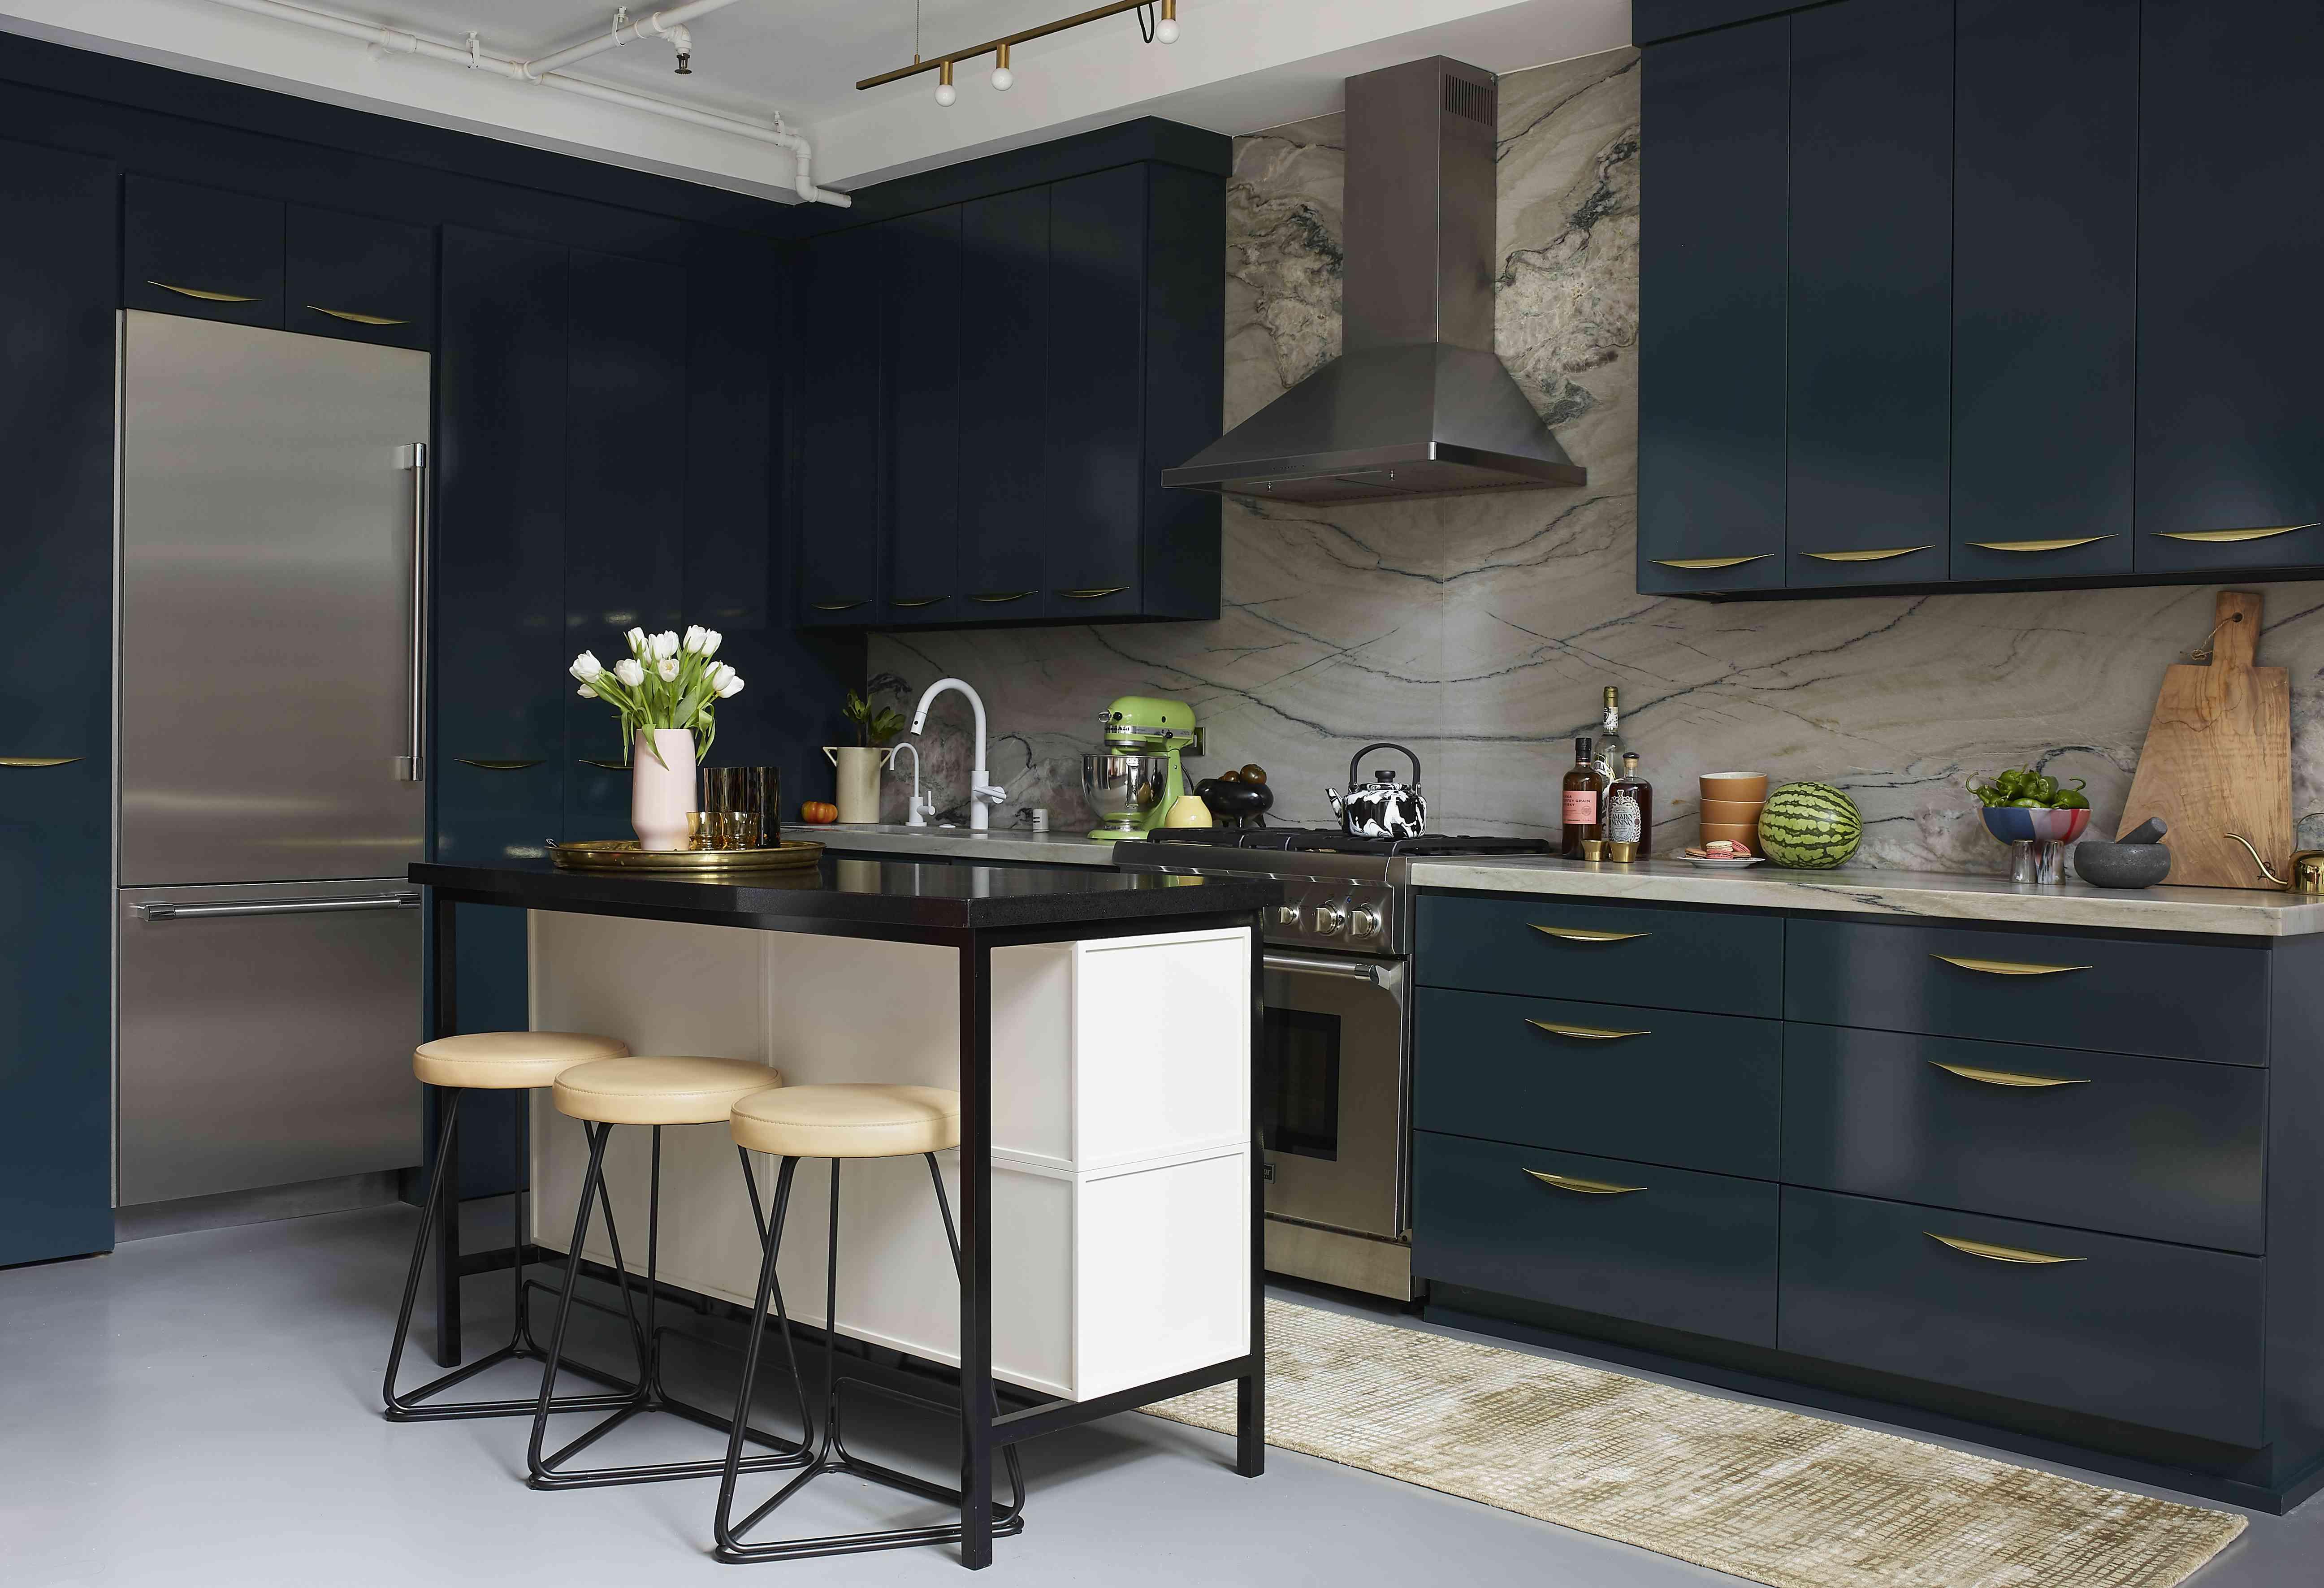 Modern kitchen with blue cabnet